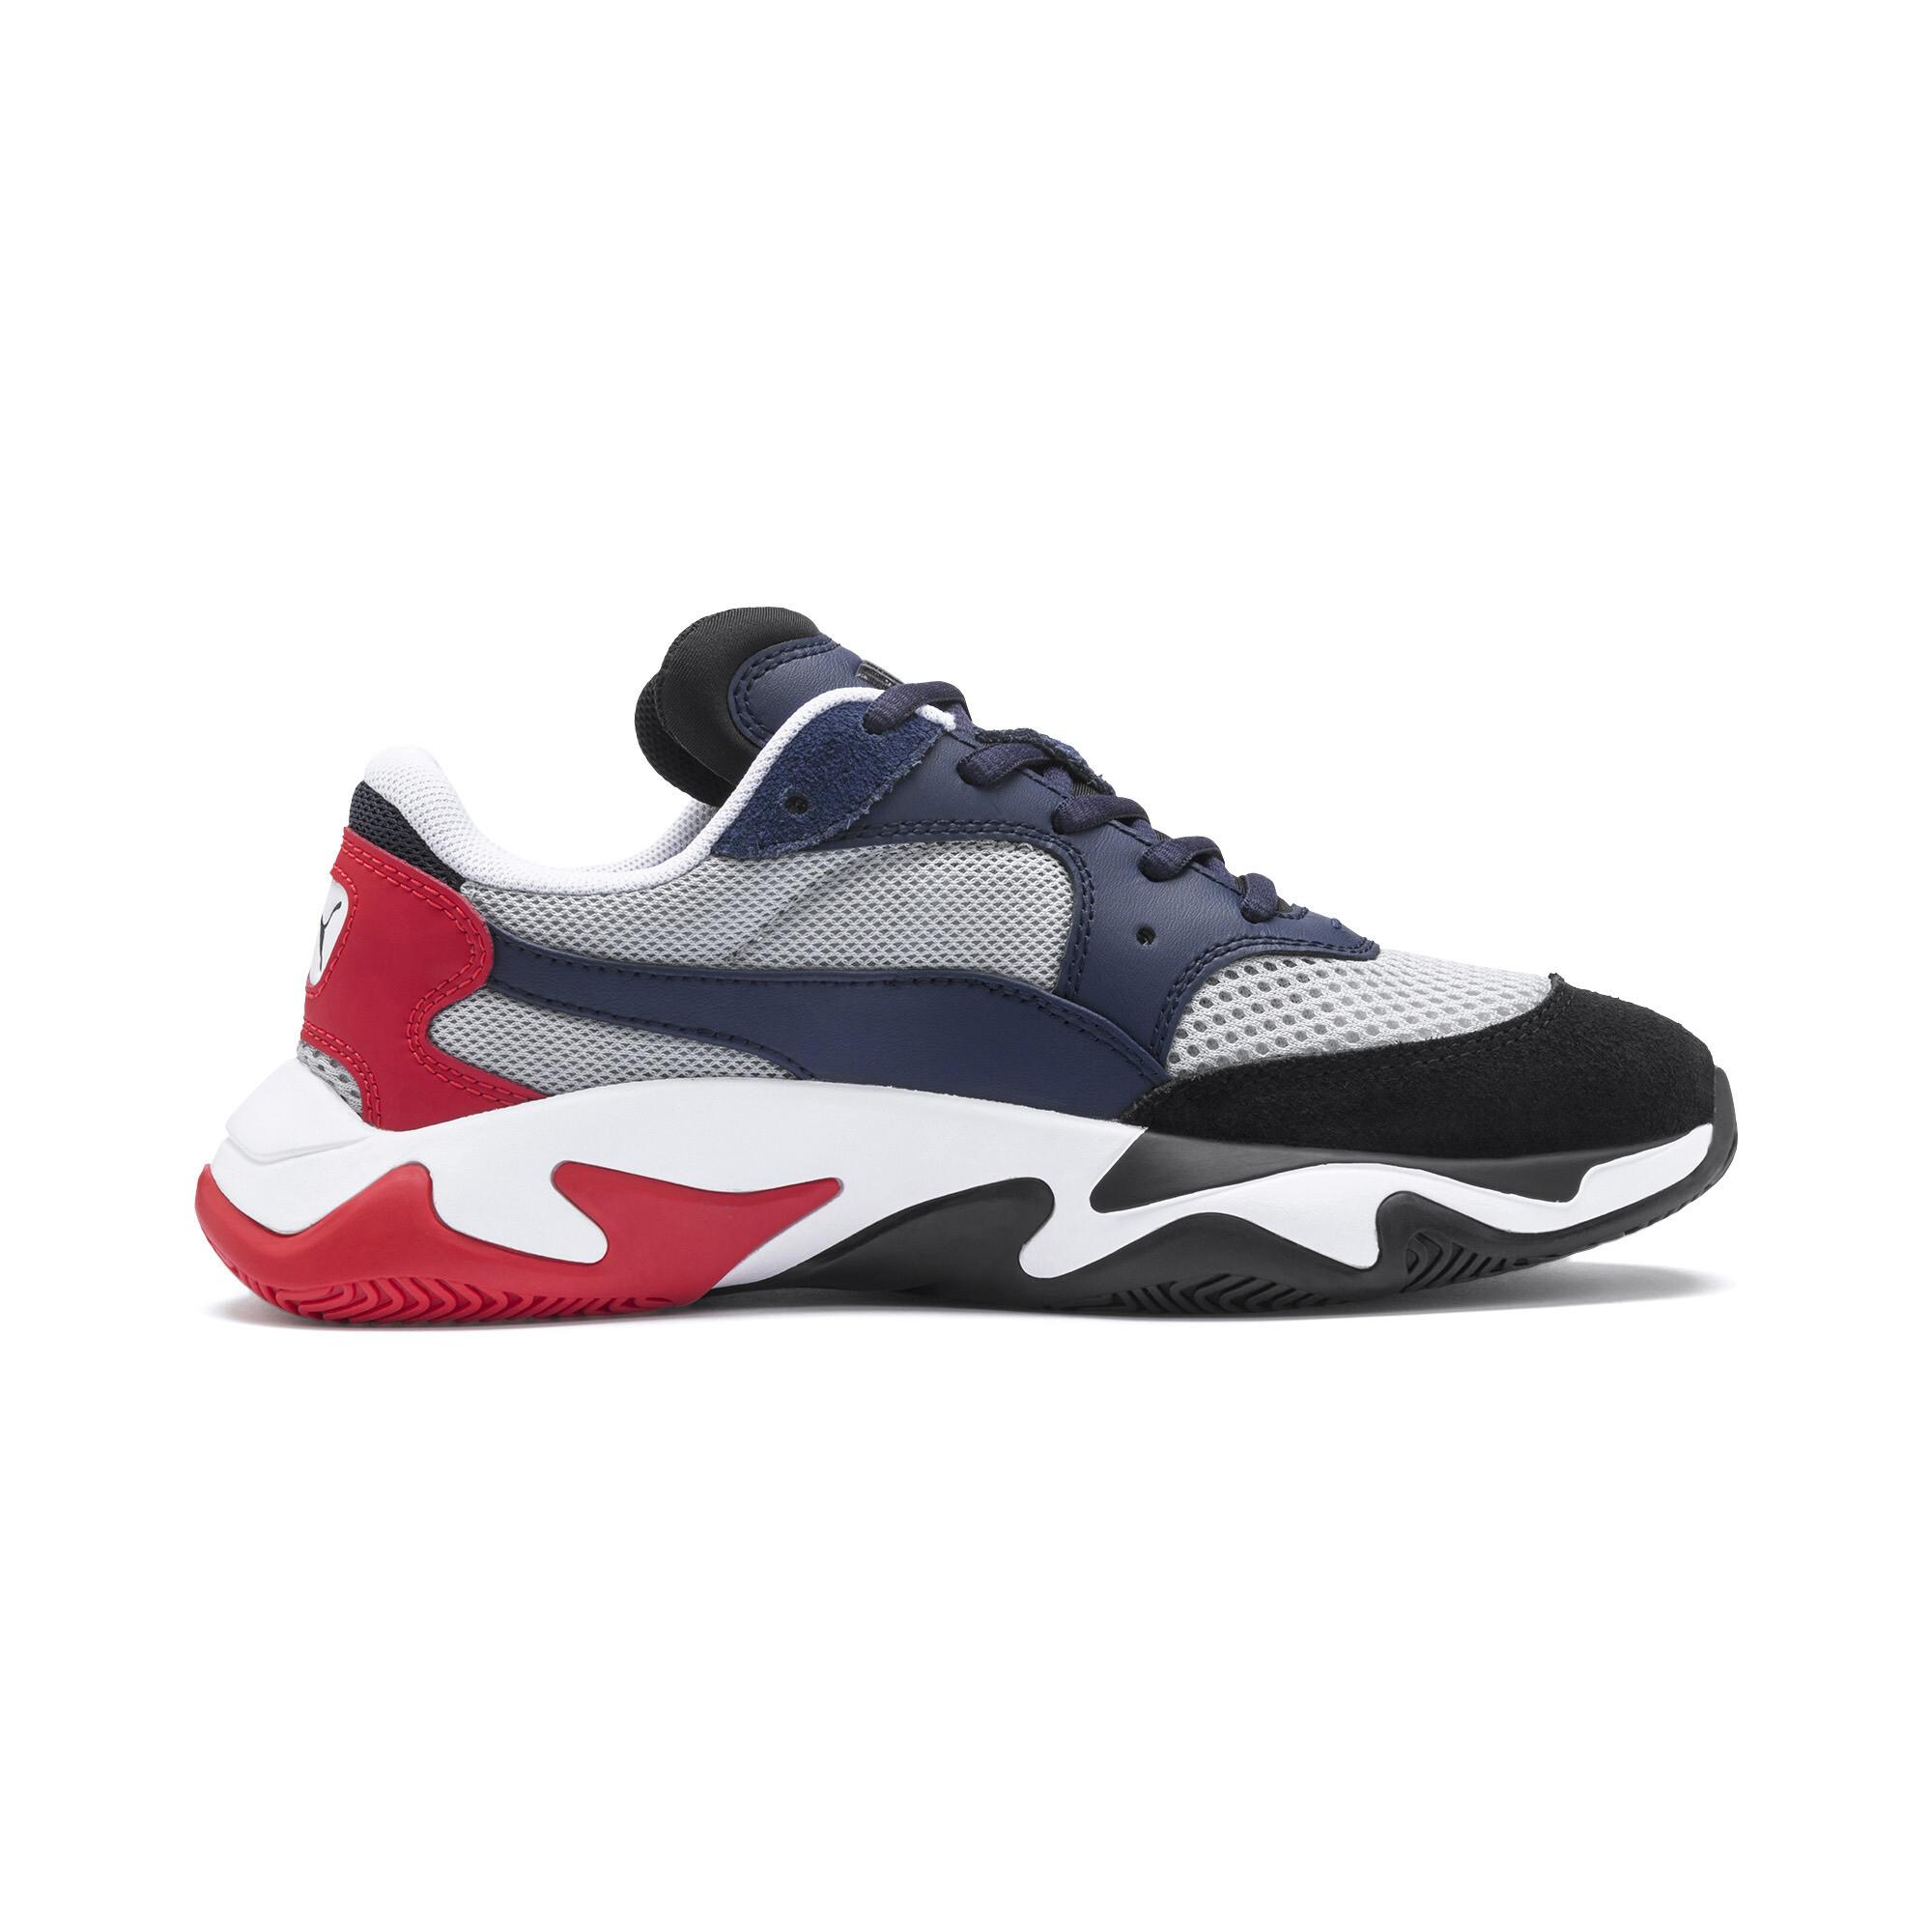 PUMA-Storm-Origin-Sneakers-JR-Kids-Shoe-Kids thumbnail 6